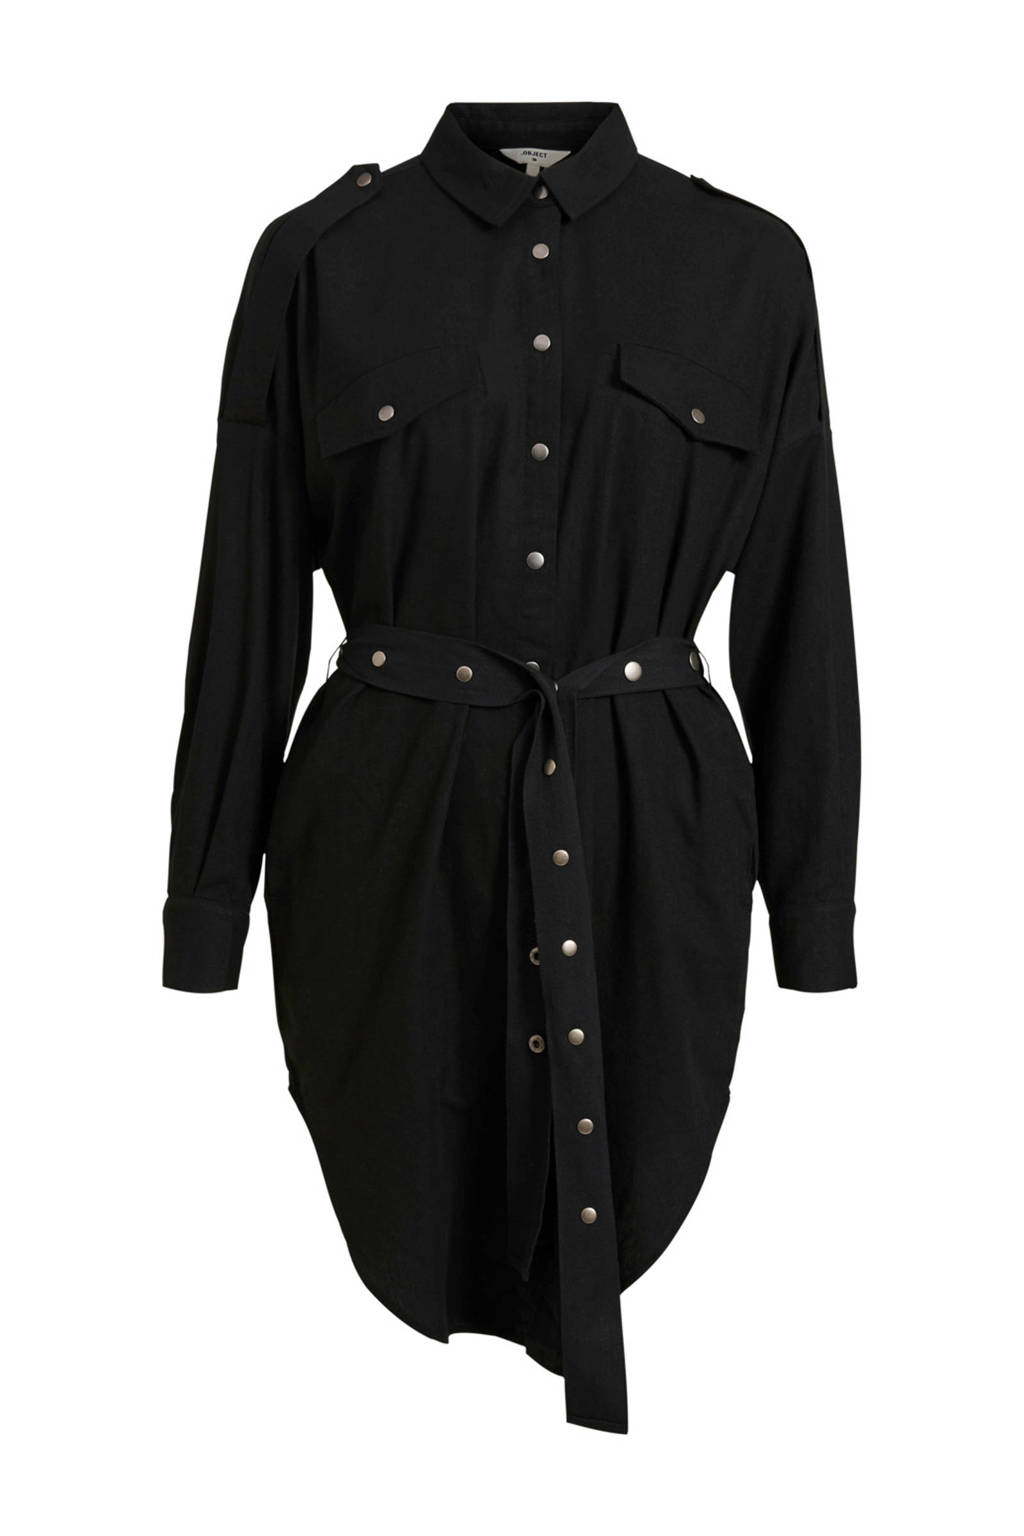 OBJECT blousejurk Binsti met linnen zwart, Zwart